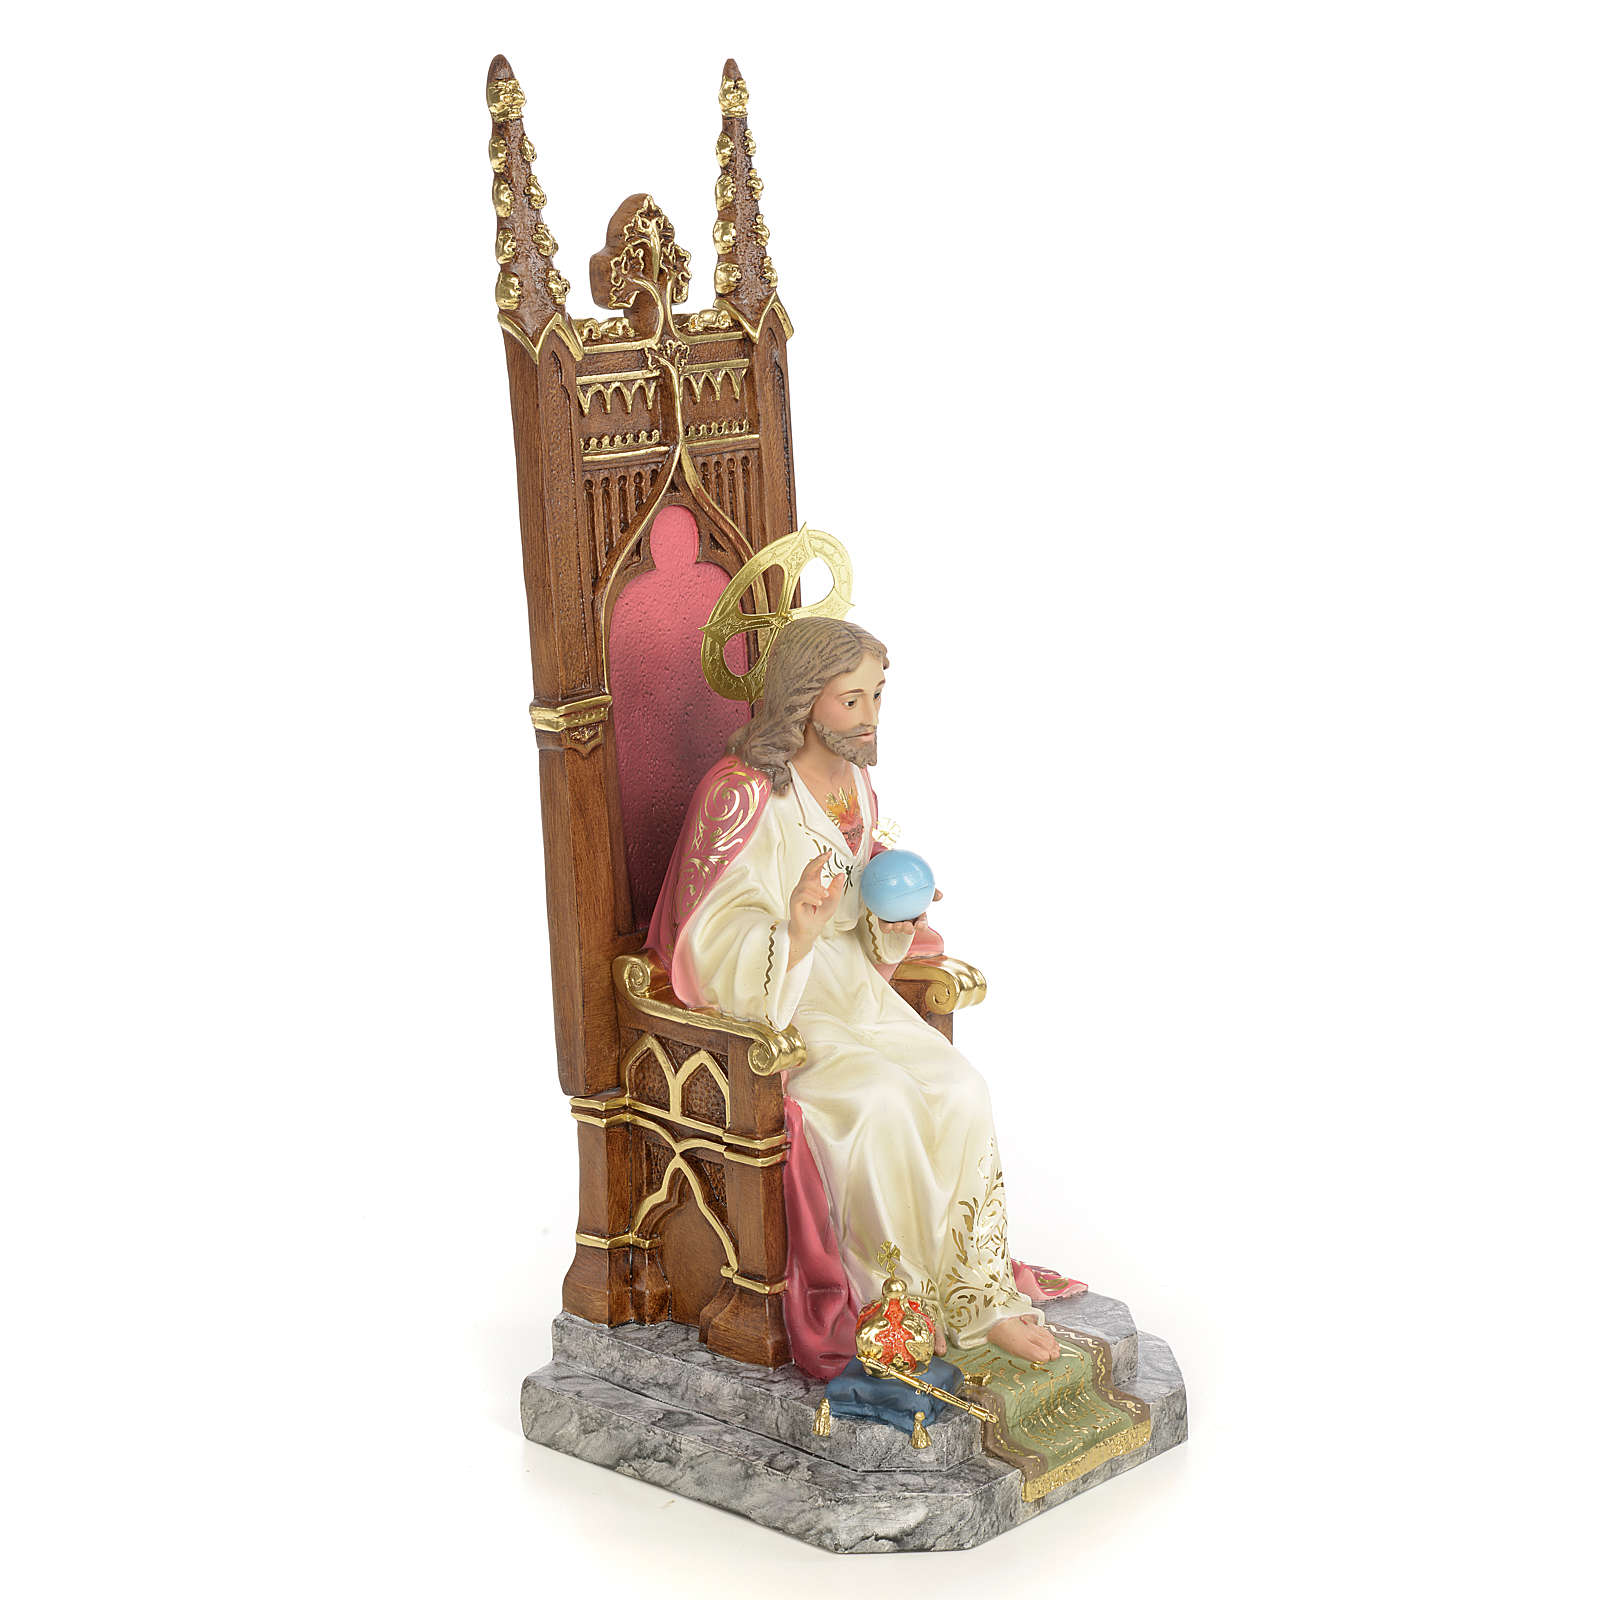 Sacred Heart of Jesus on throne statue 30cm, wood paste, elegant 4